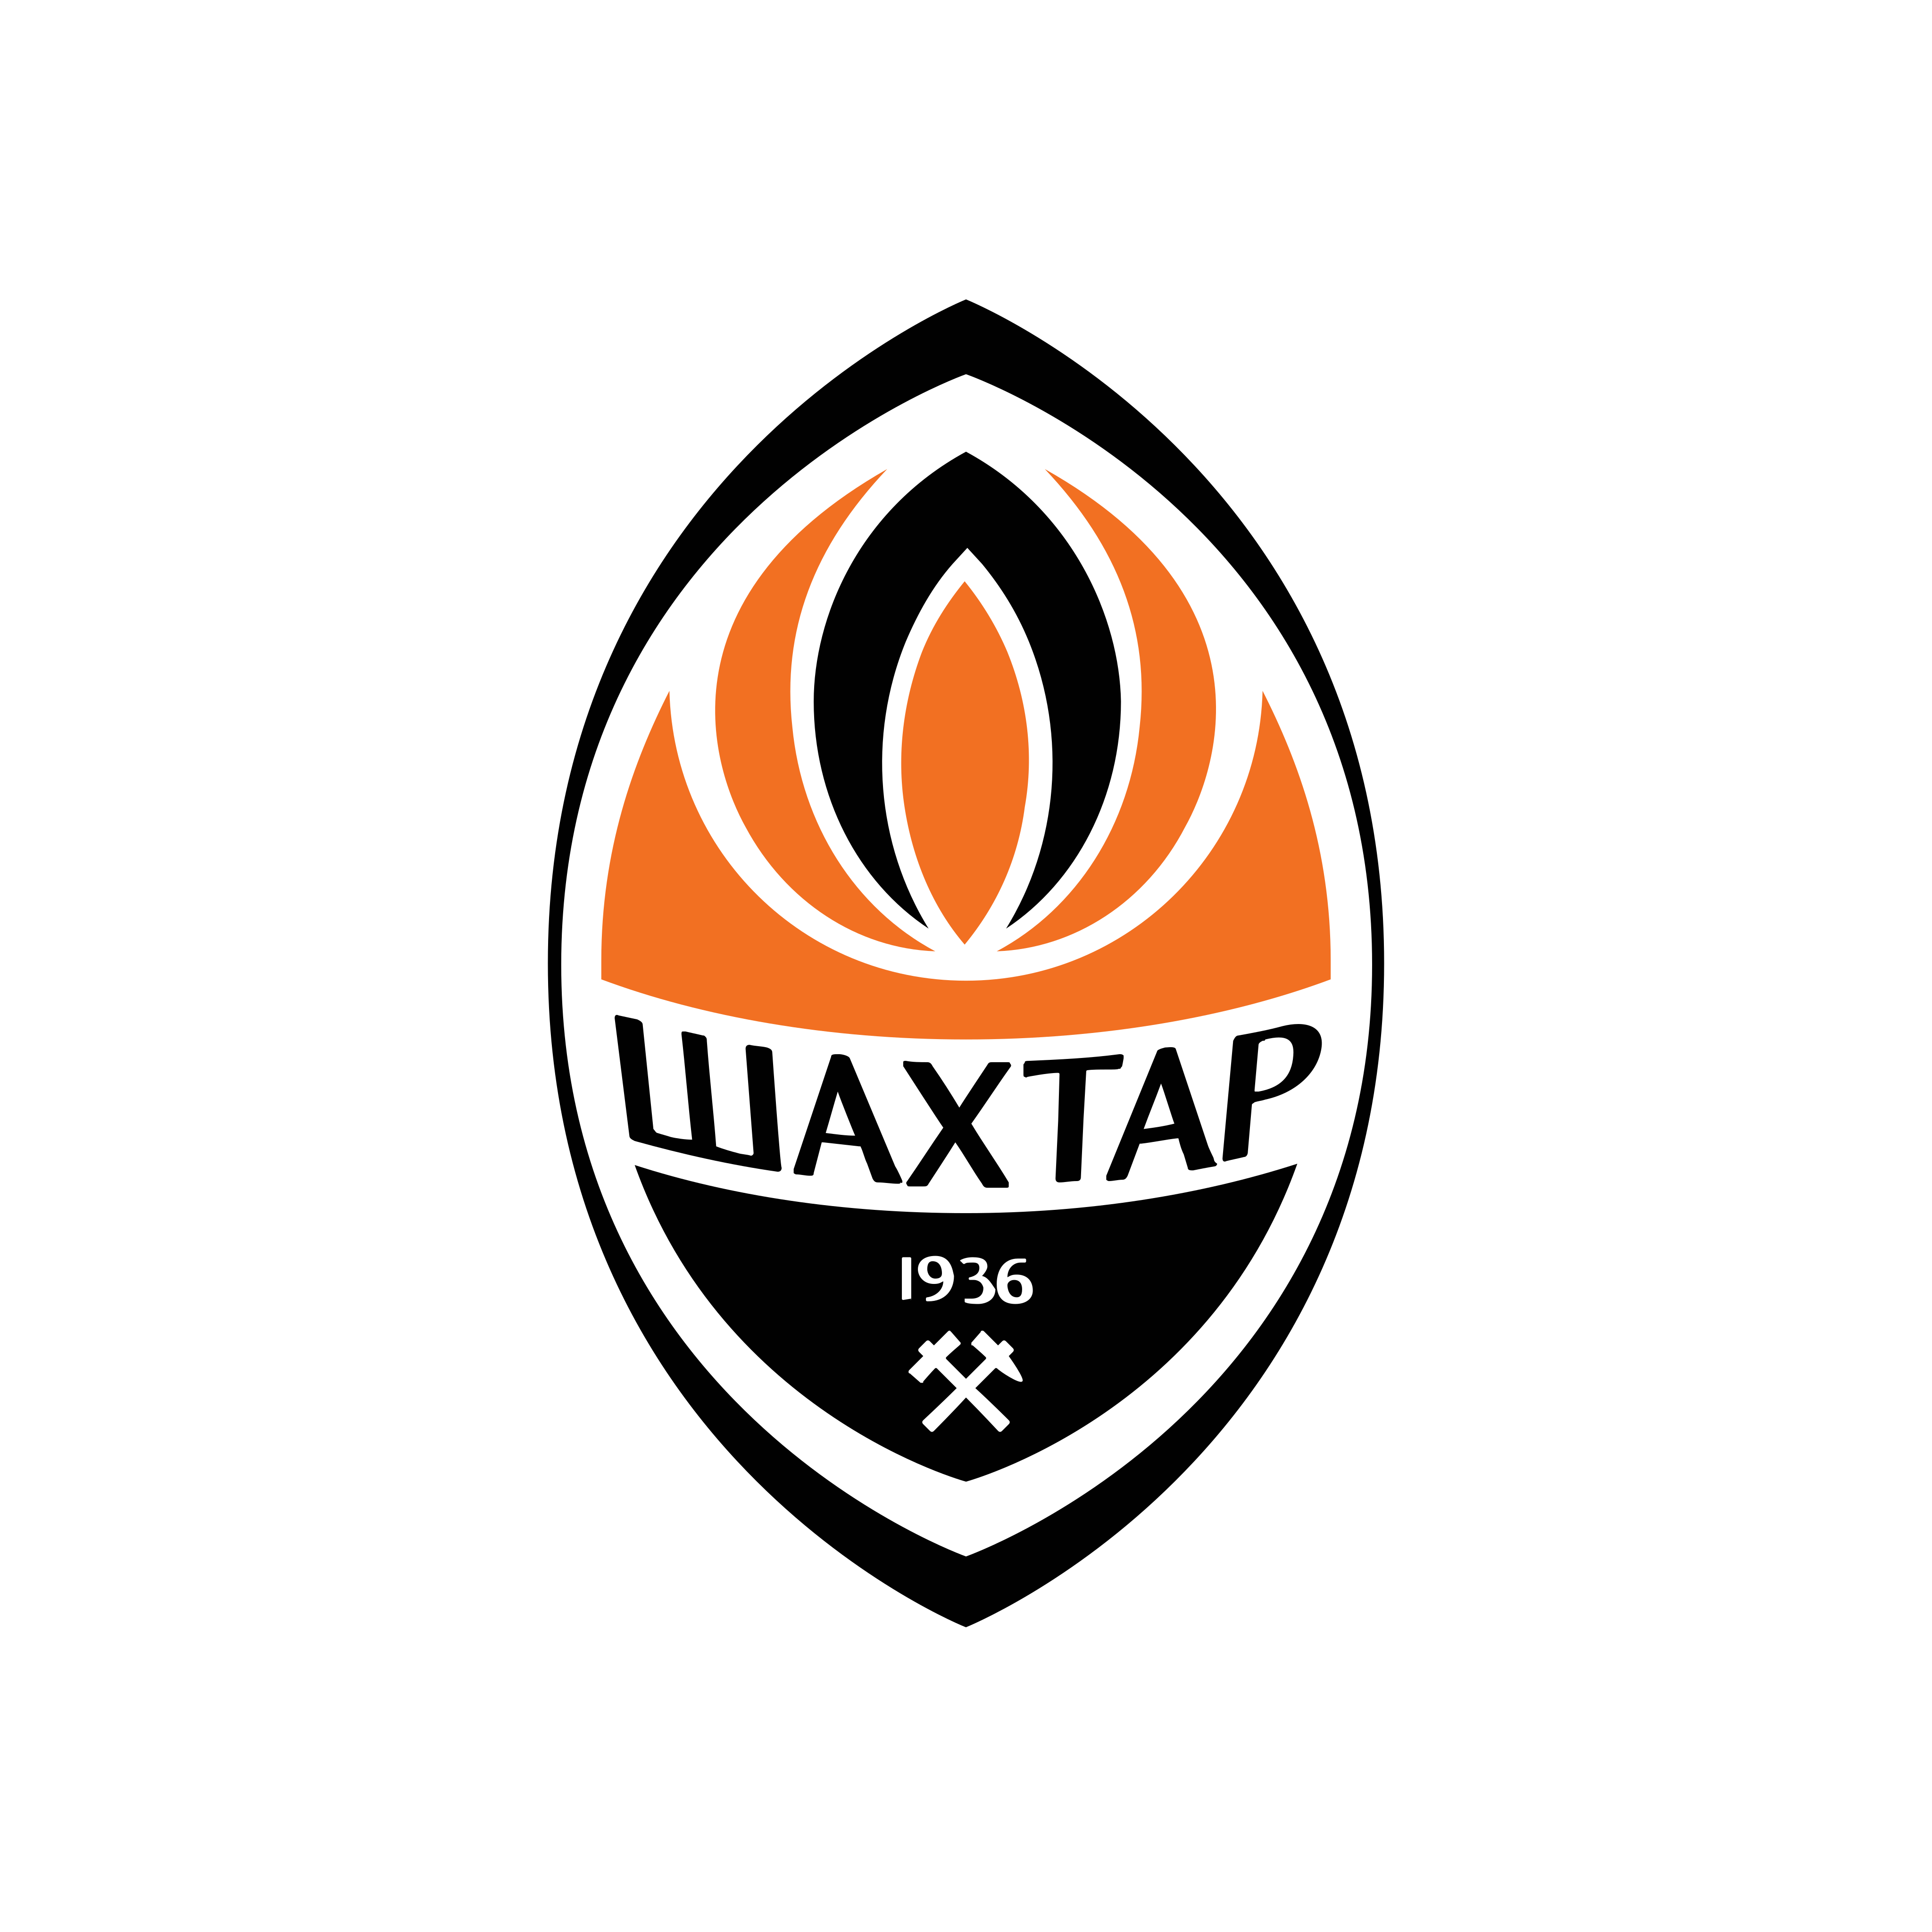 shakhtar logo 0 - FK Shakhtar Logo - Escudo